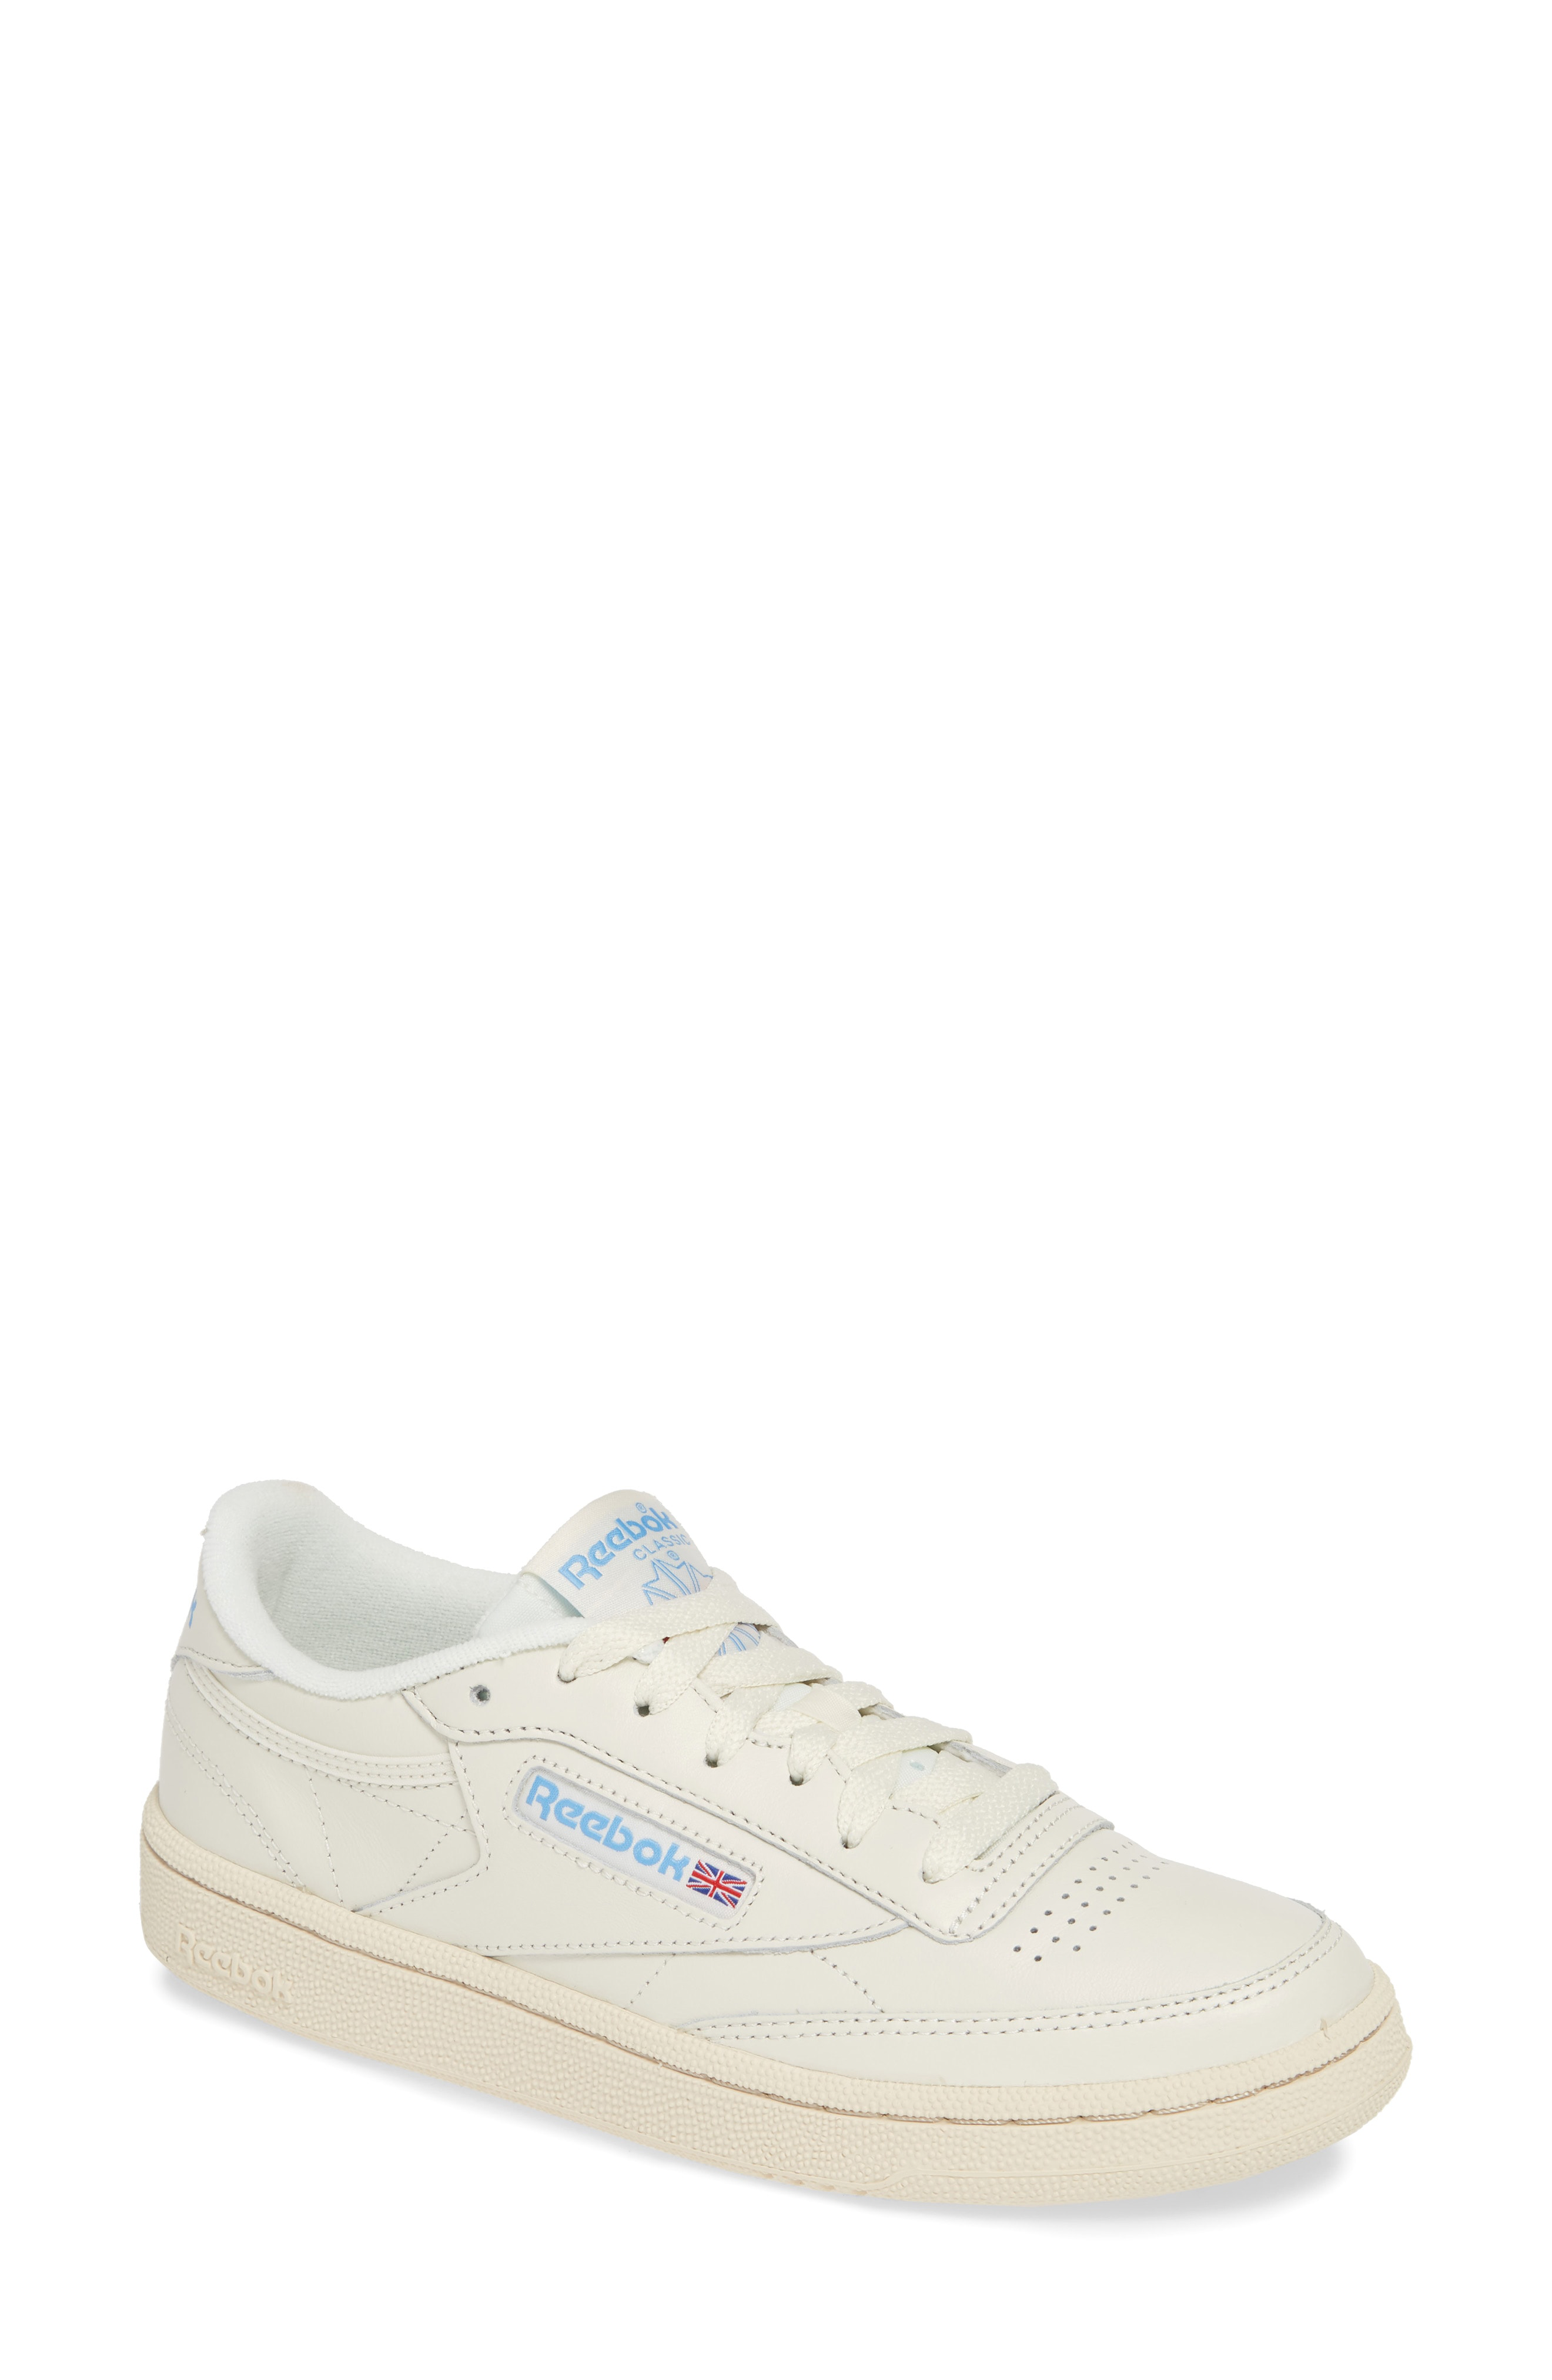 65df3e89cdb6 Reebok Club C 85 Sneaker In Chalk  Paperwhite  Blue